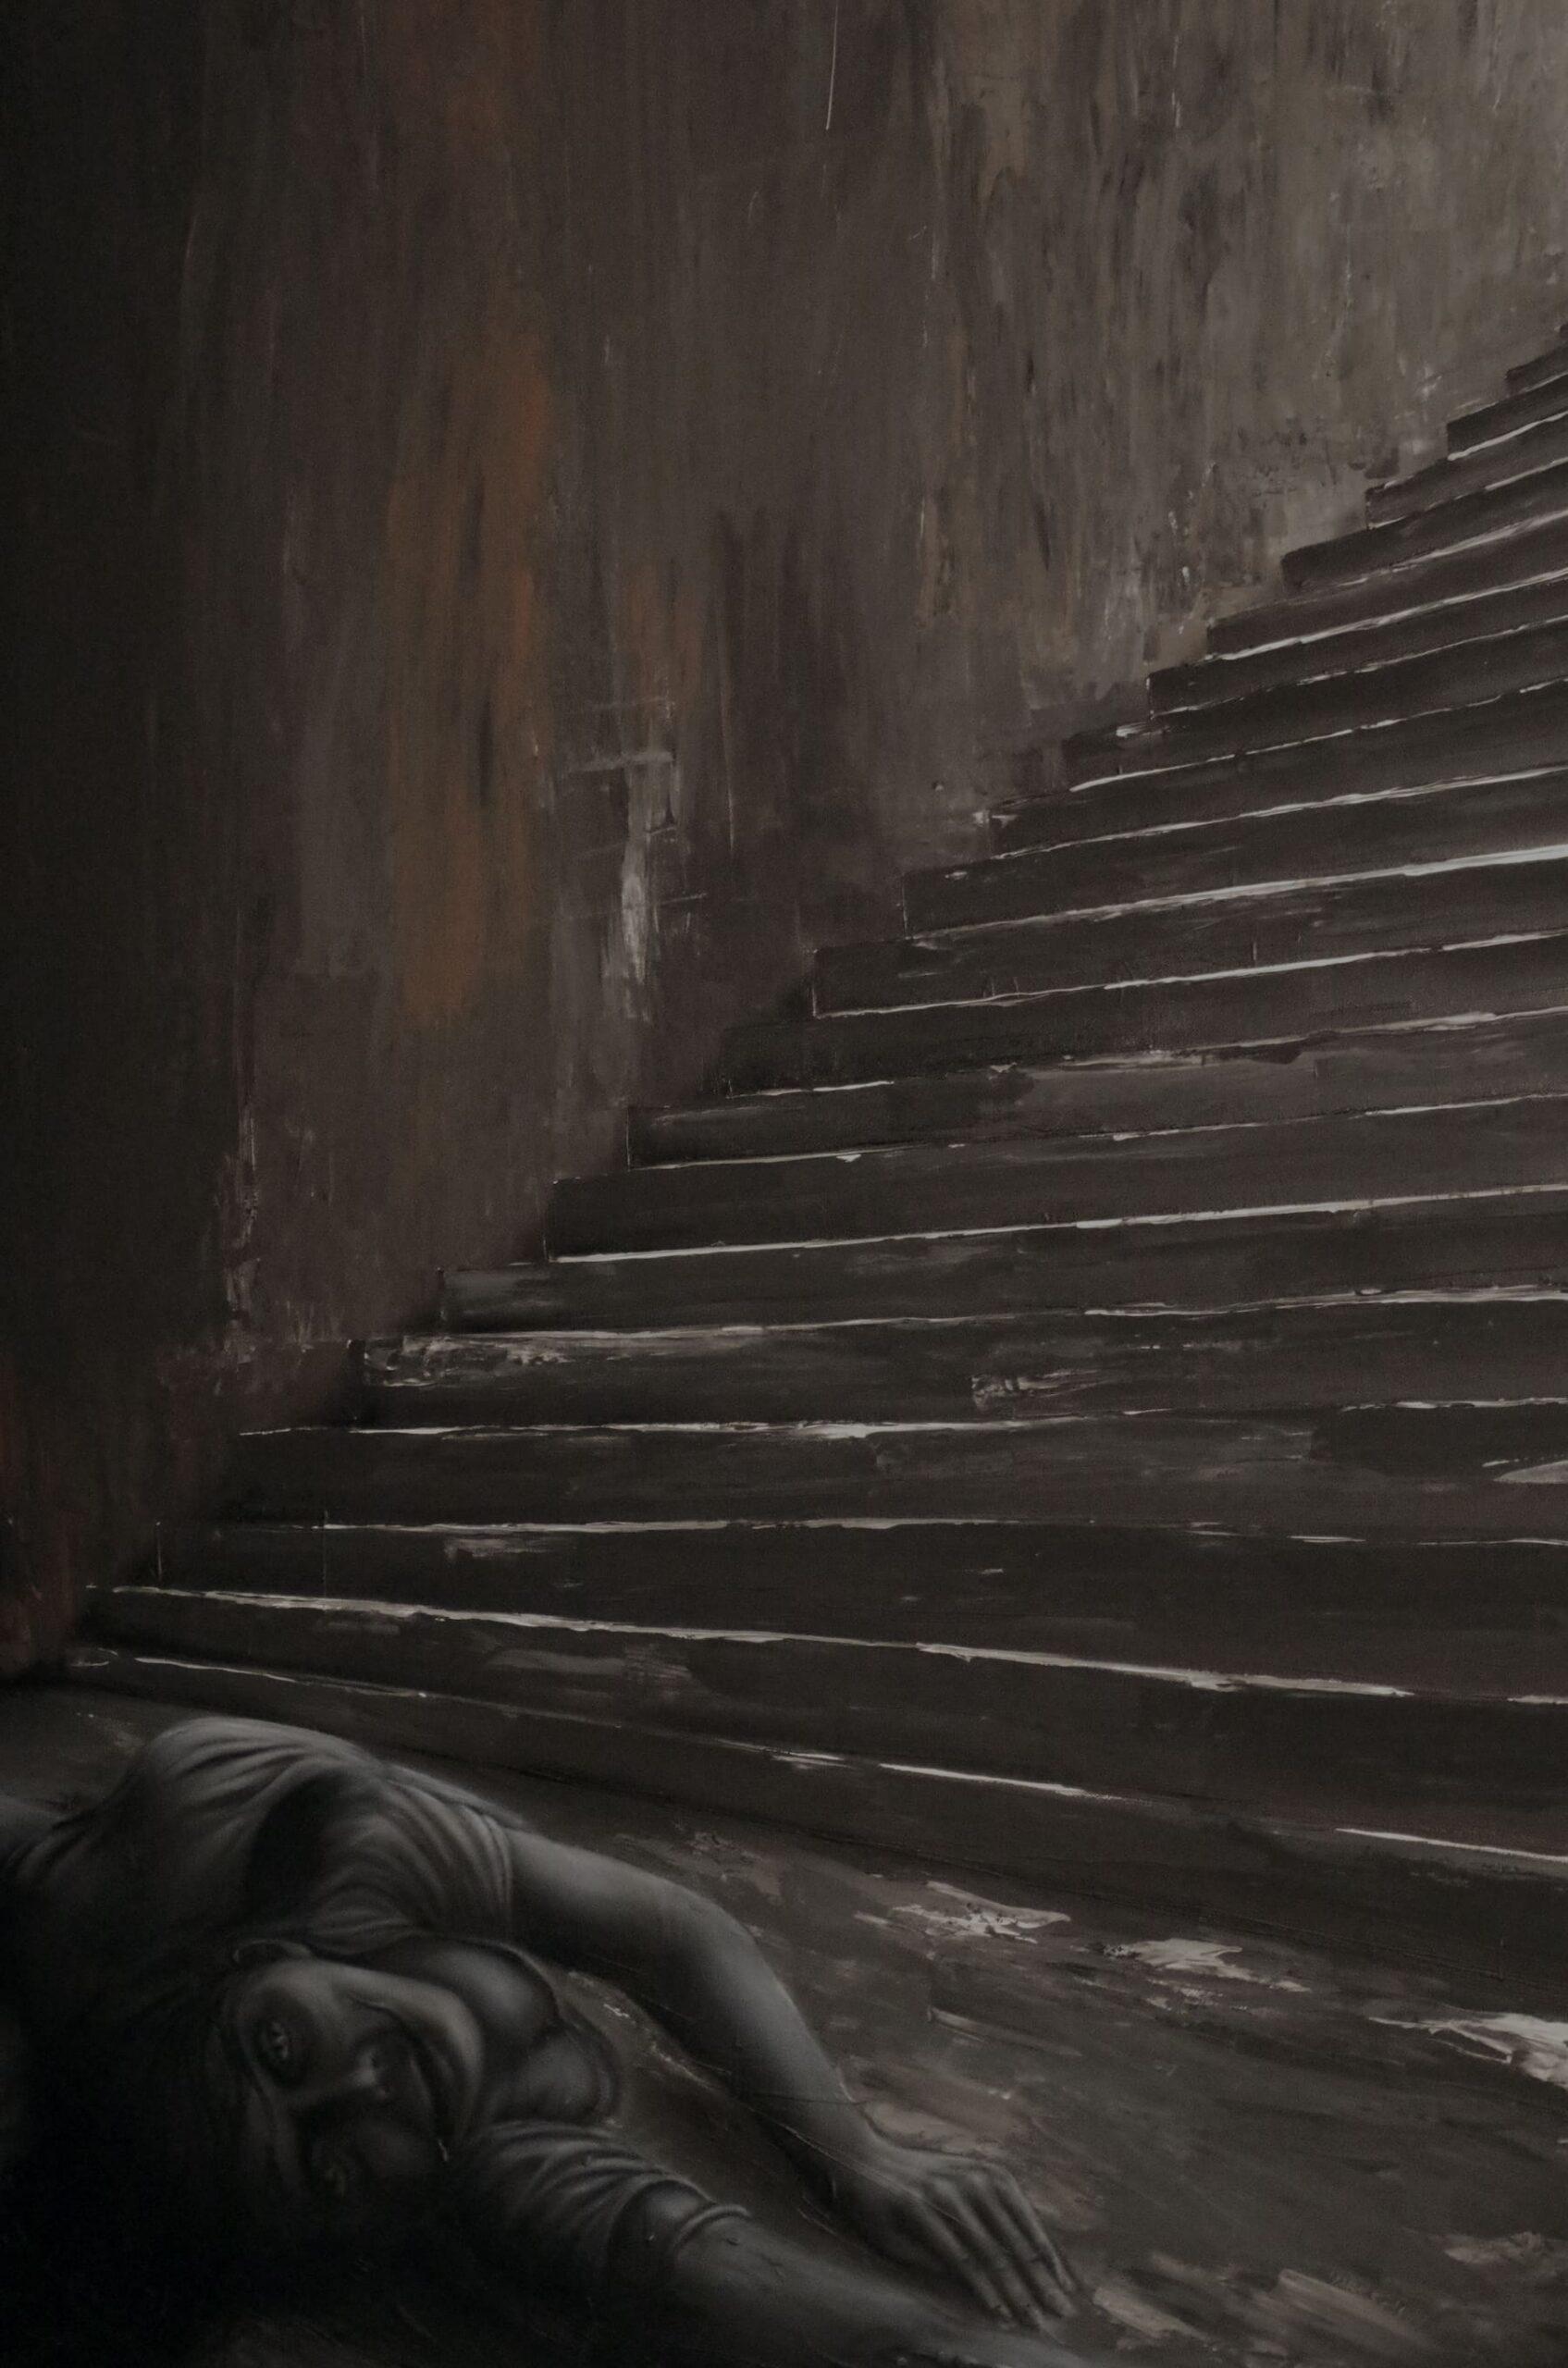 die treppeairbrushundspachtel